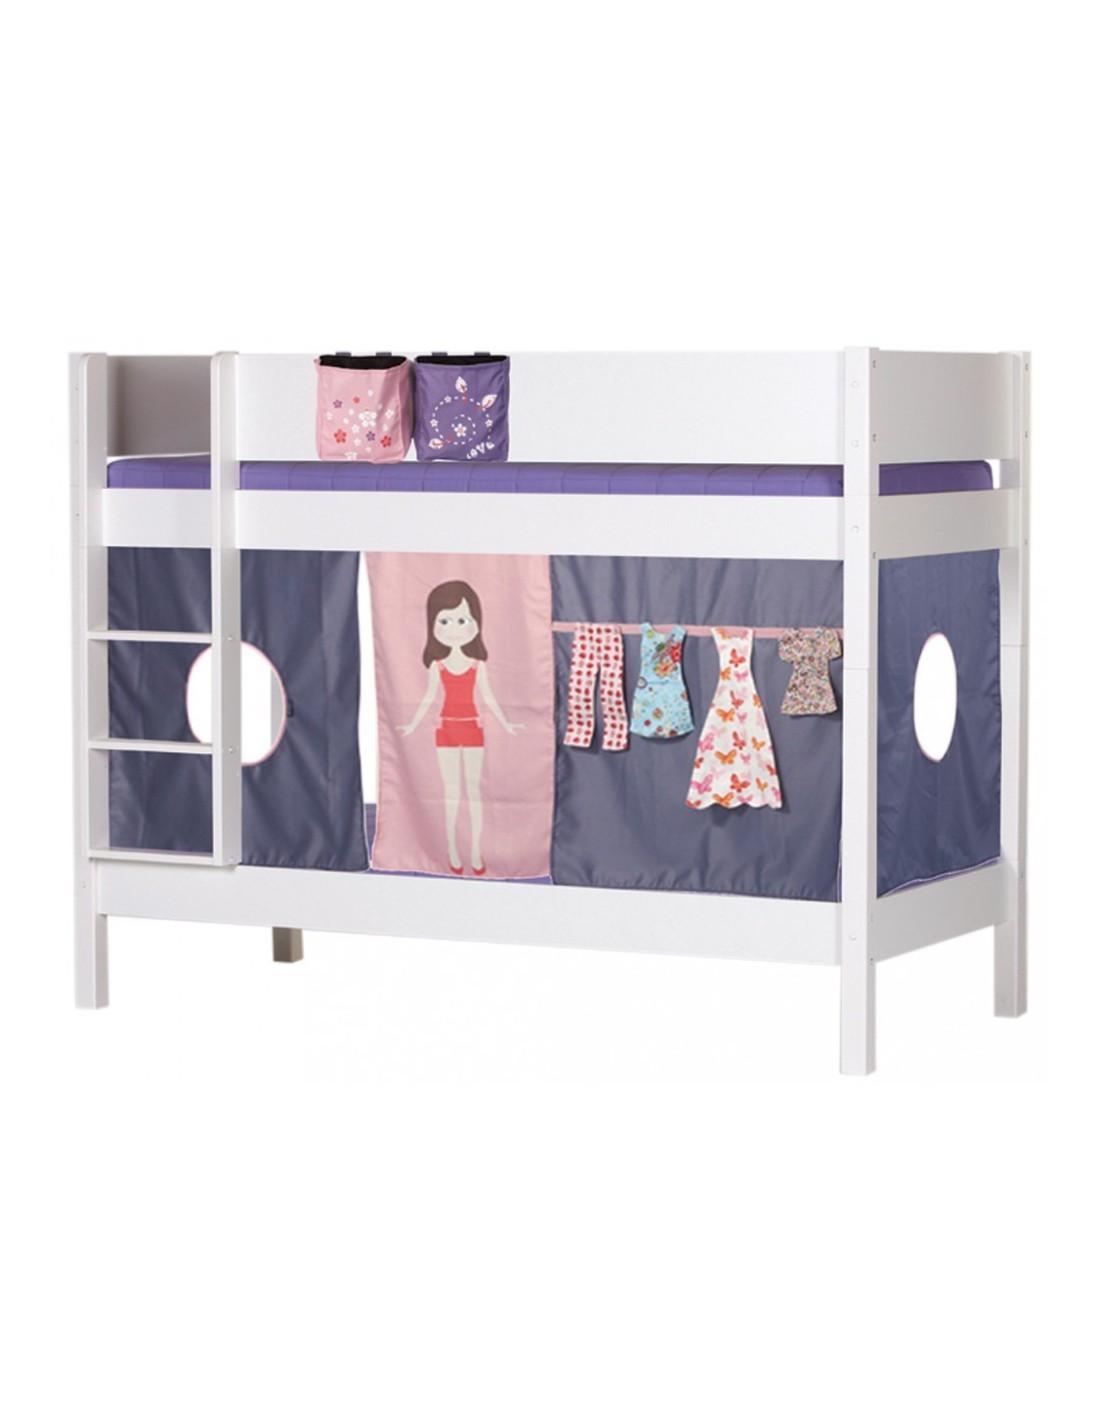 tente de lit dressing de fille. Black Bedroom Furniture Sets. Home Design Ideas